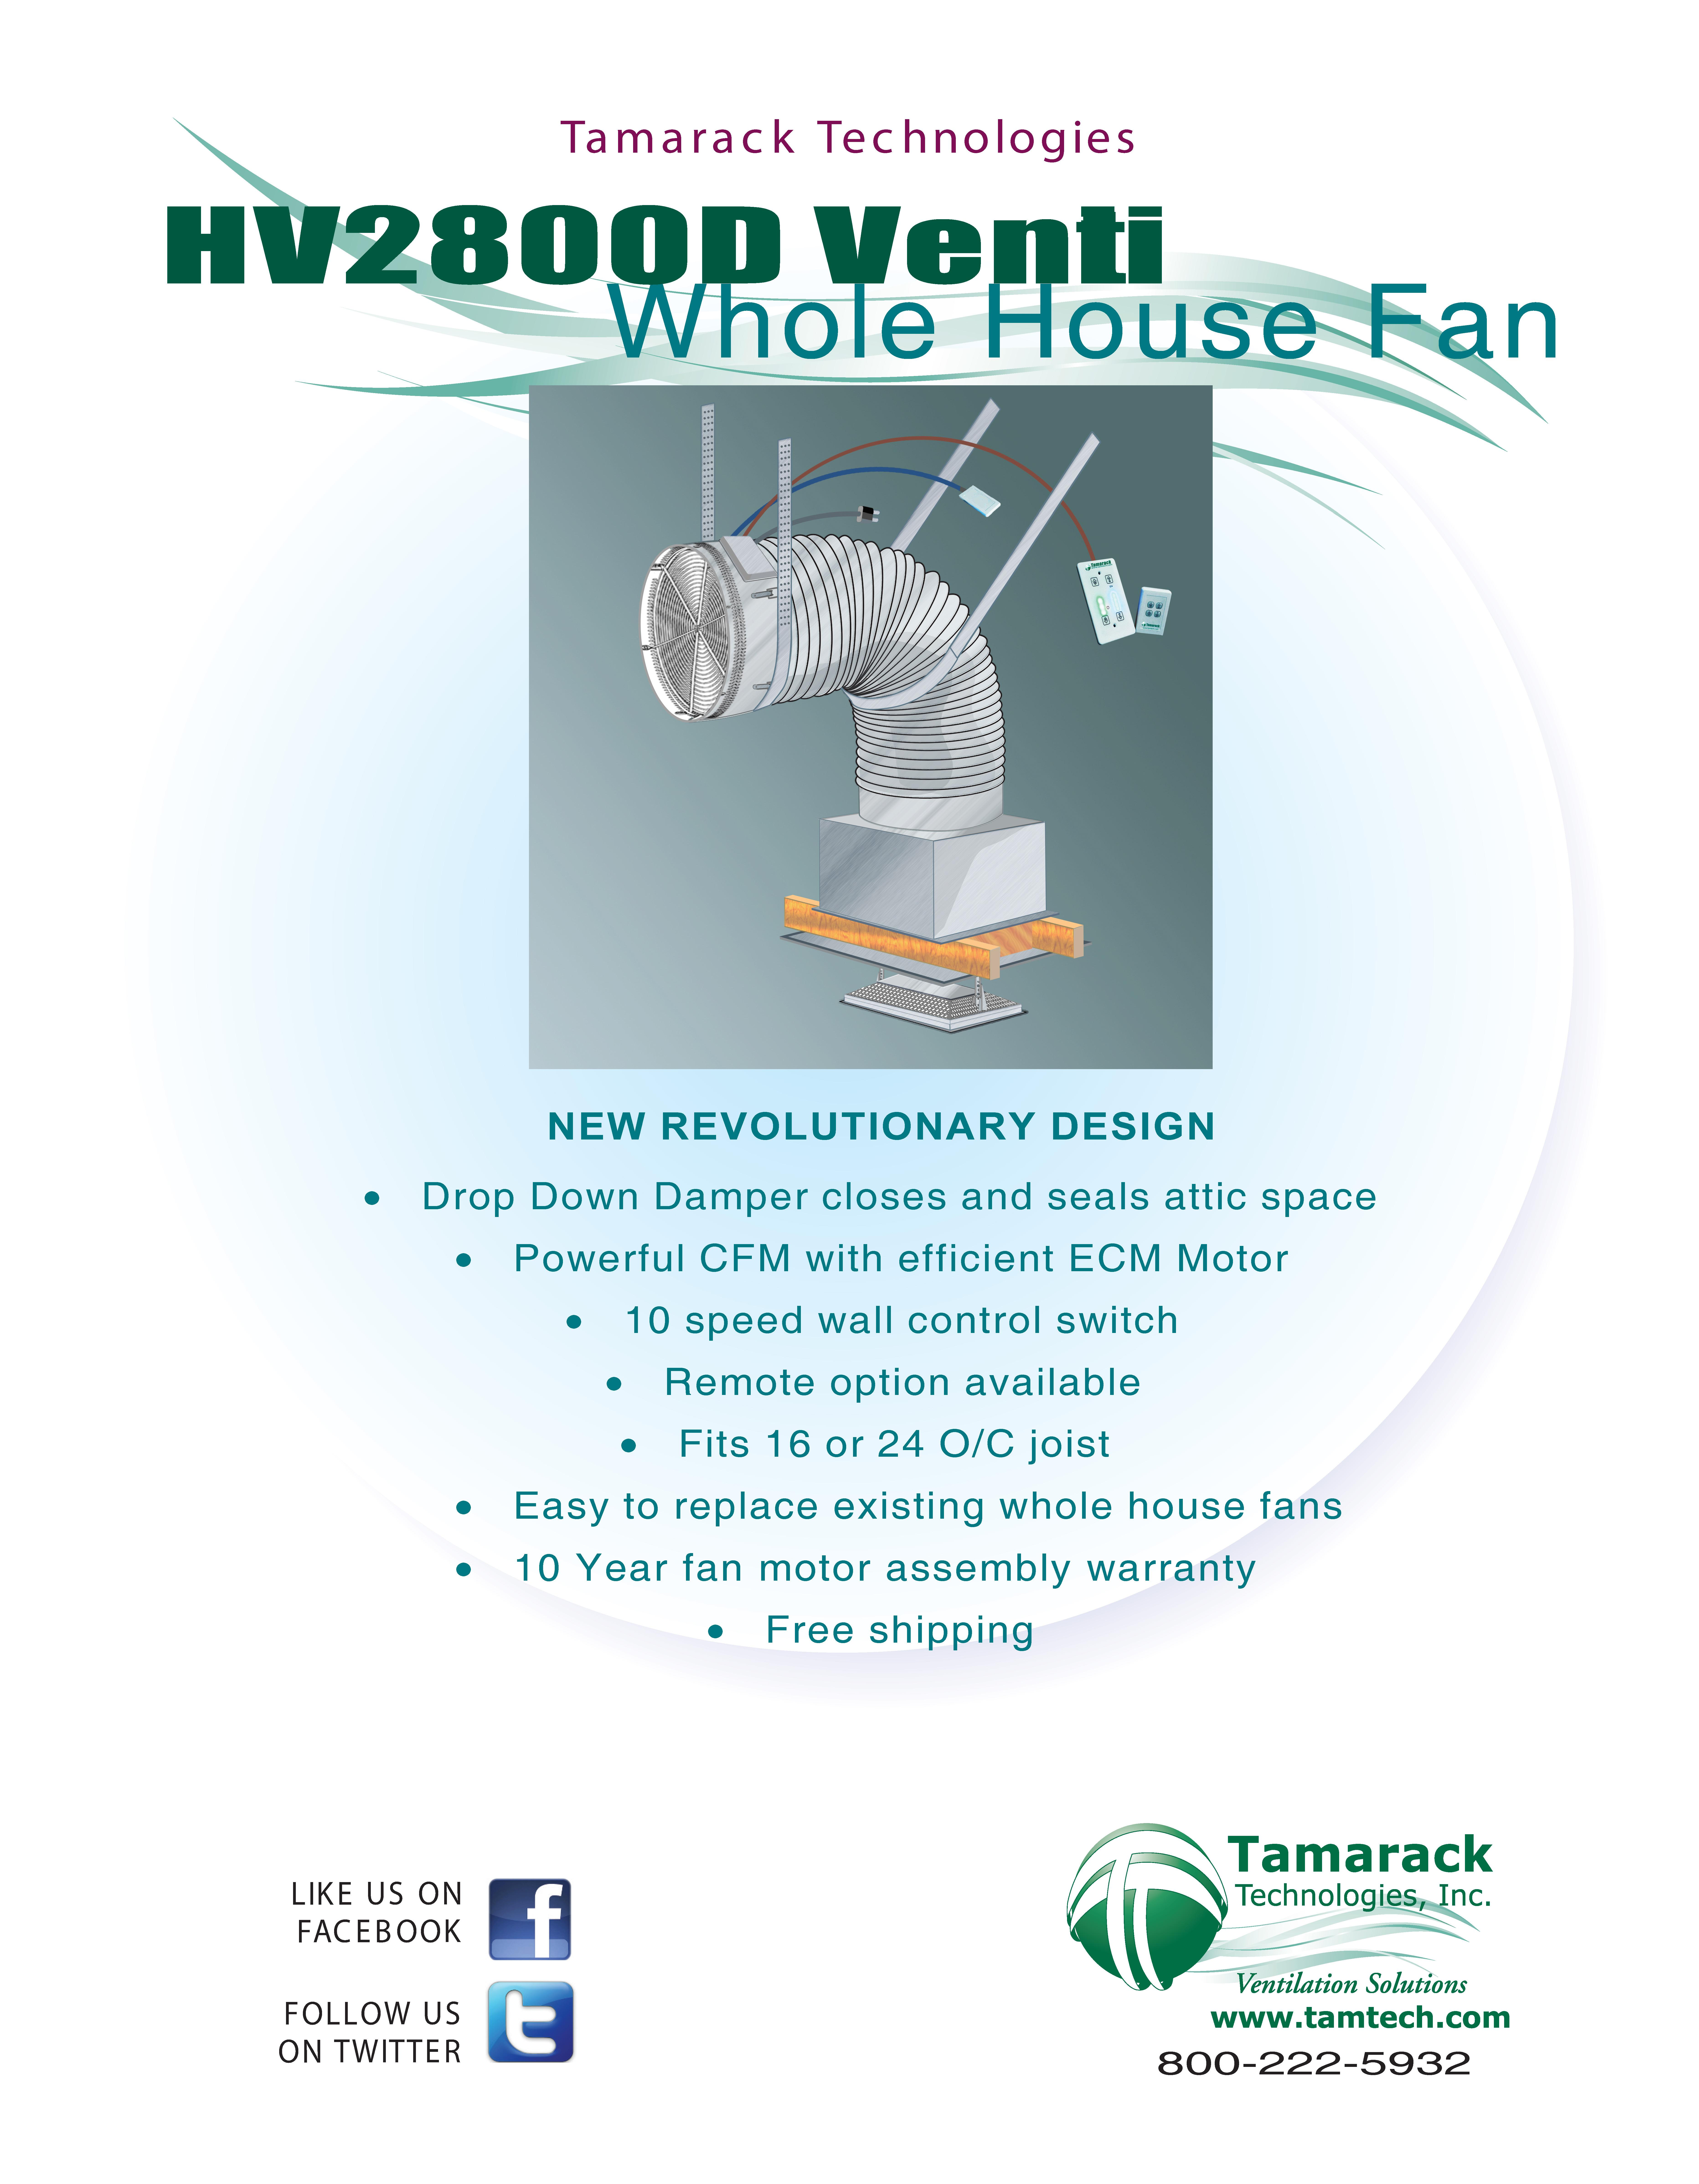 HV2800D Venti Whole House Fan